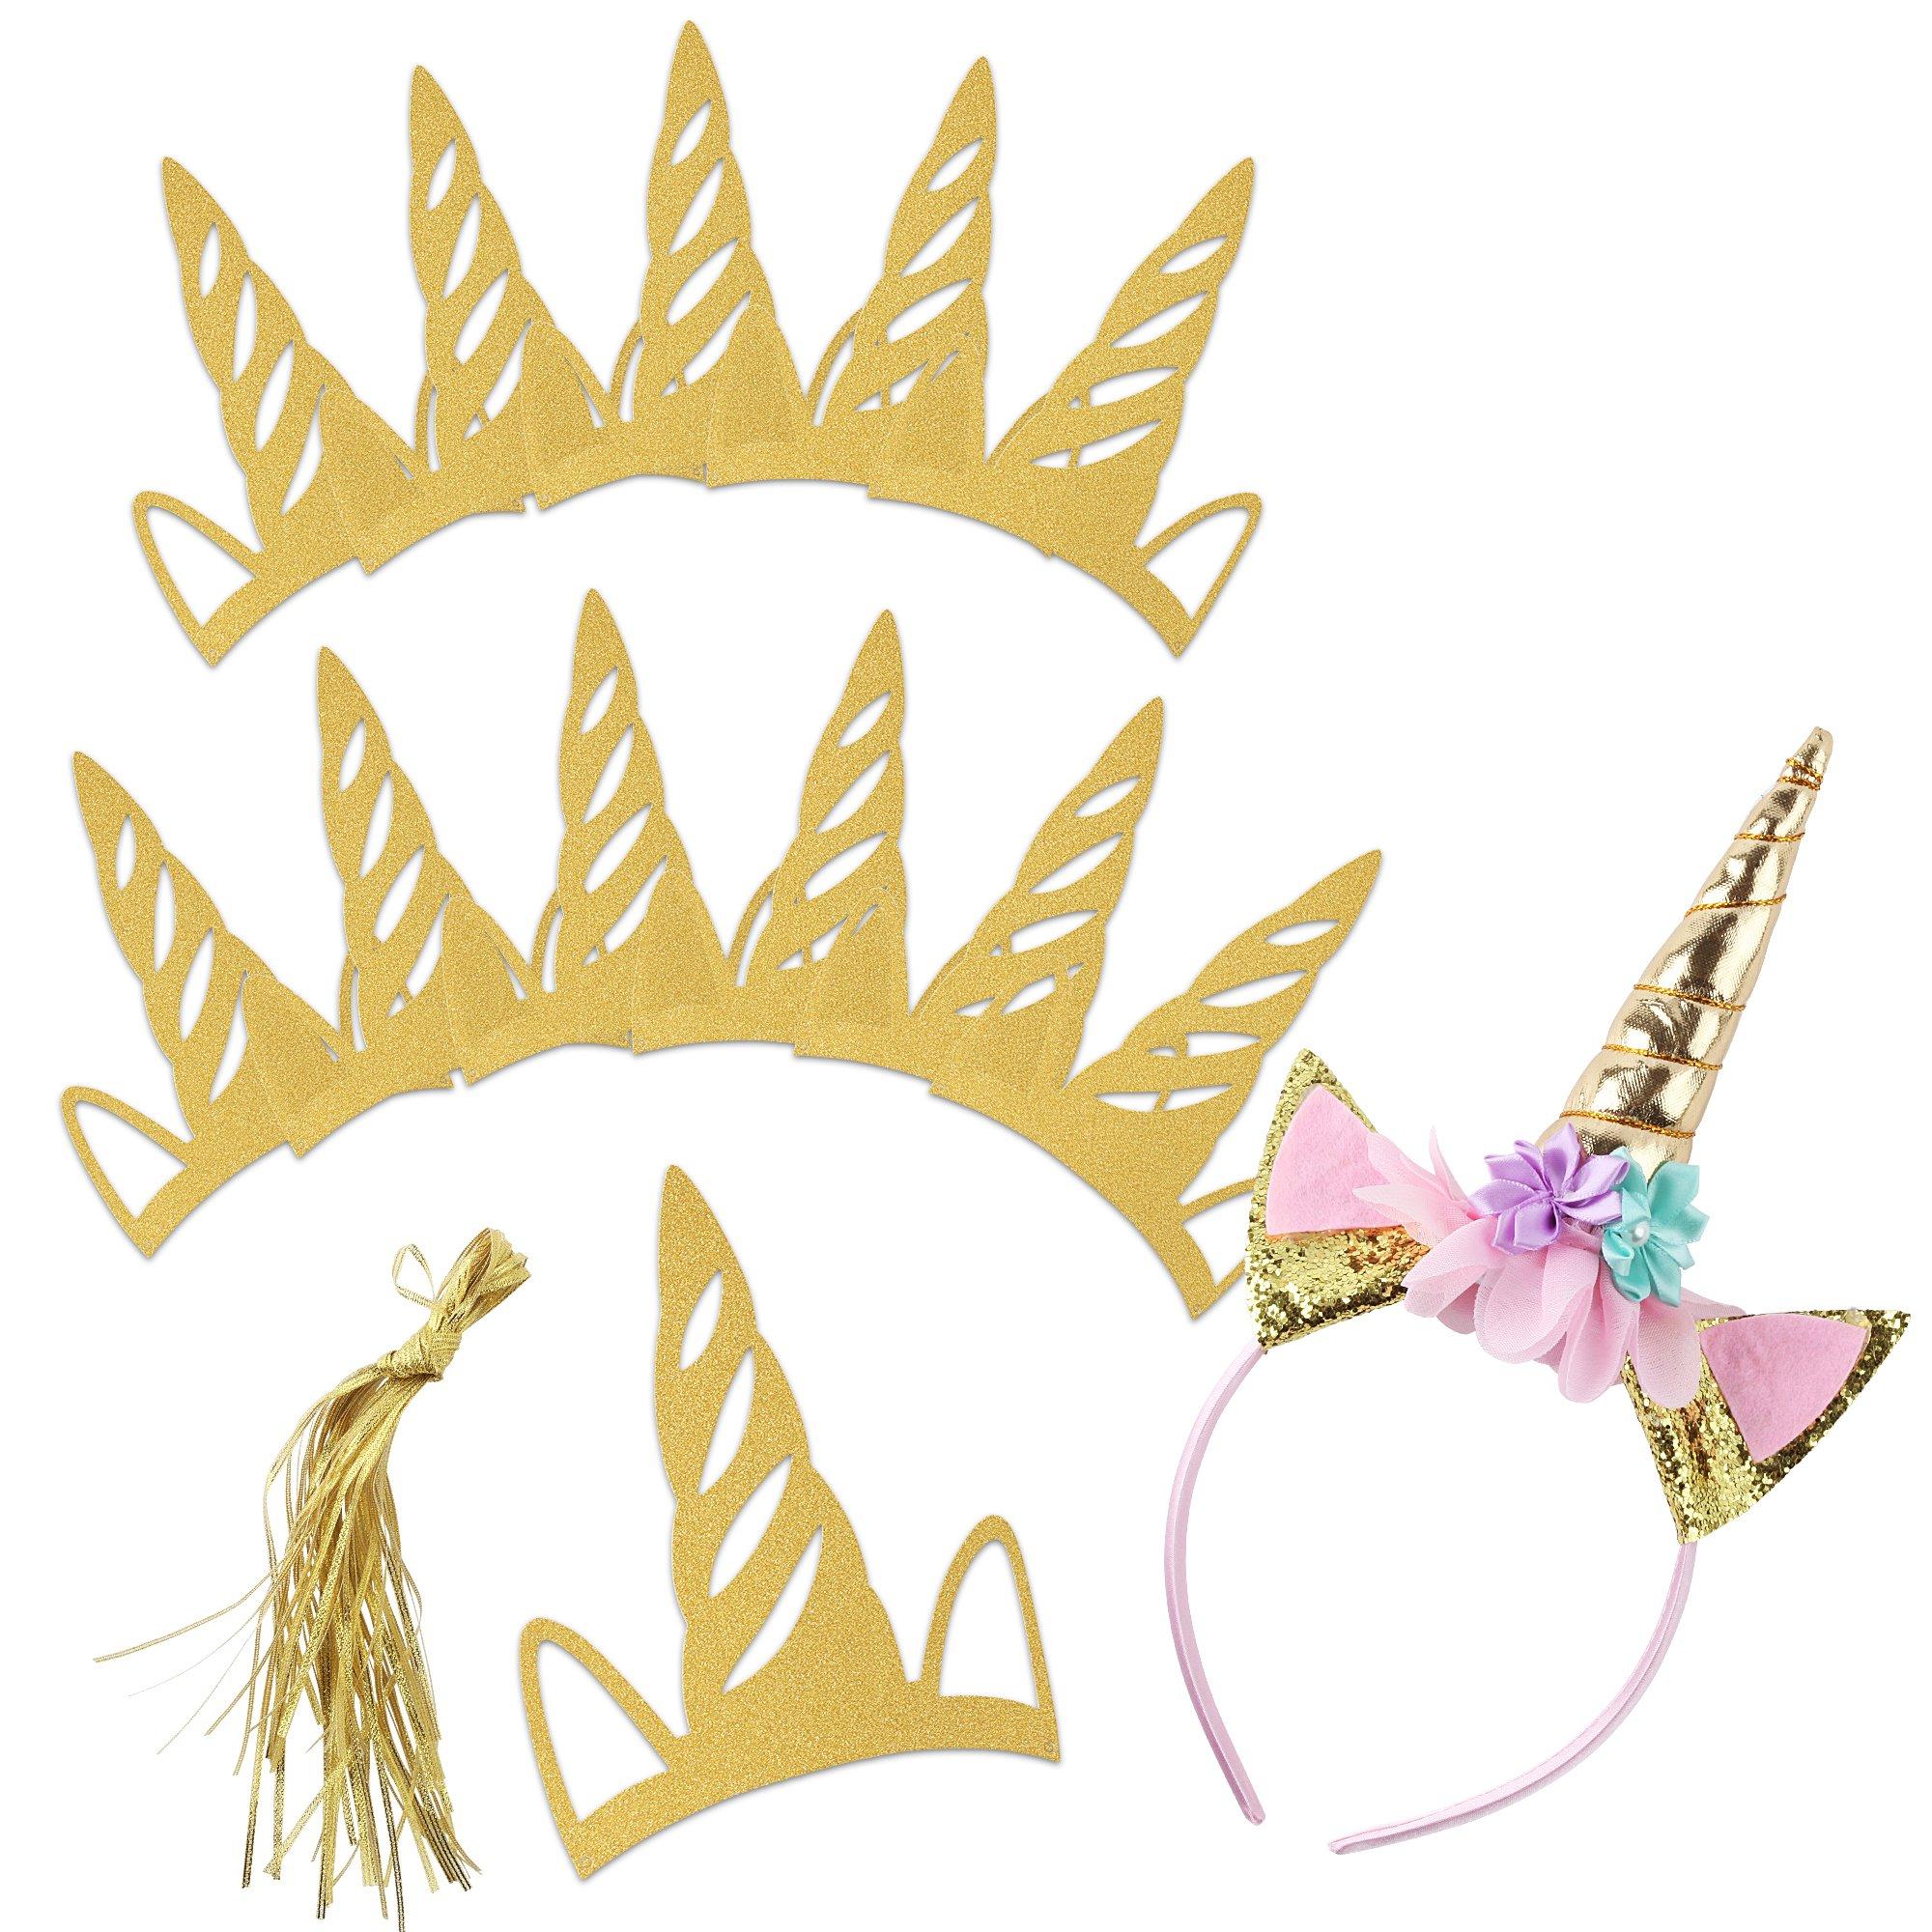 Unicorn Headband Party Hats 13 Pack: Includes 1 Birthday Headband and 12  Glitter Paper Headbands, Birthday Favor Pack (Rainbow Unicorn)